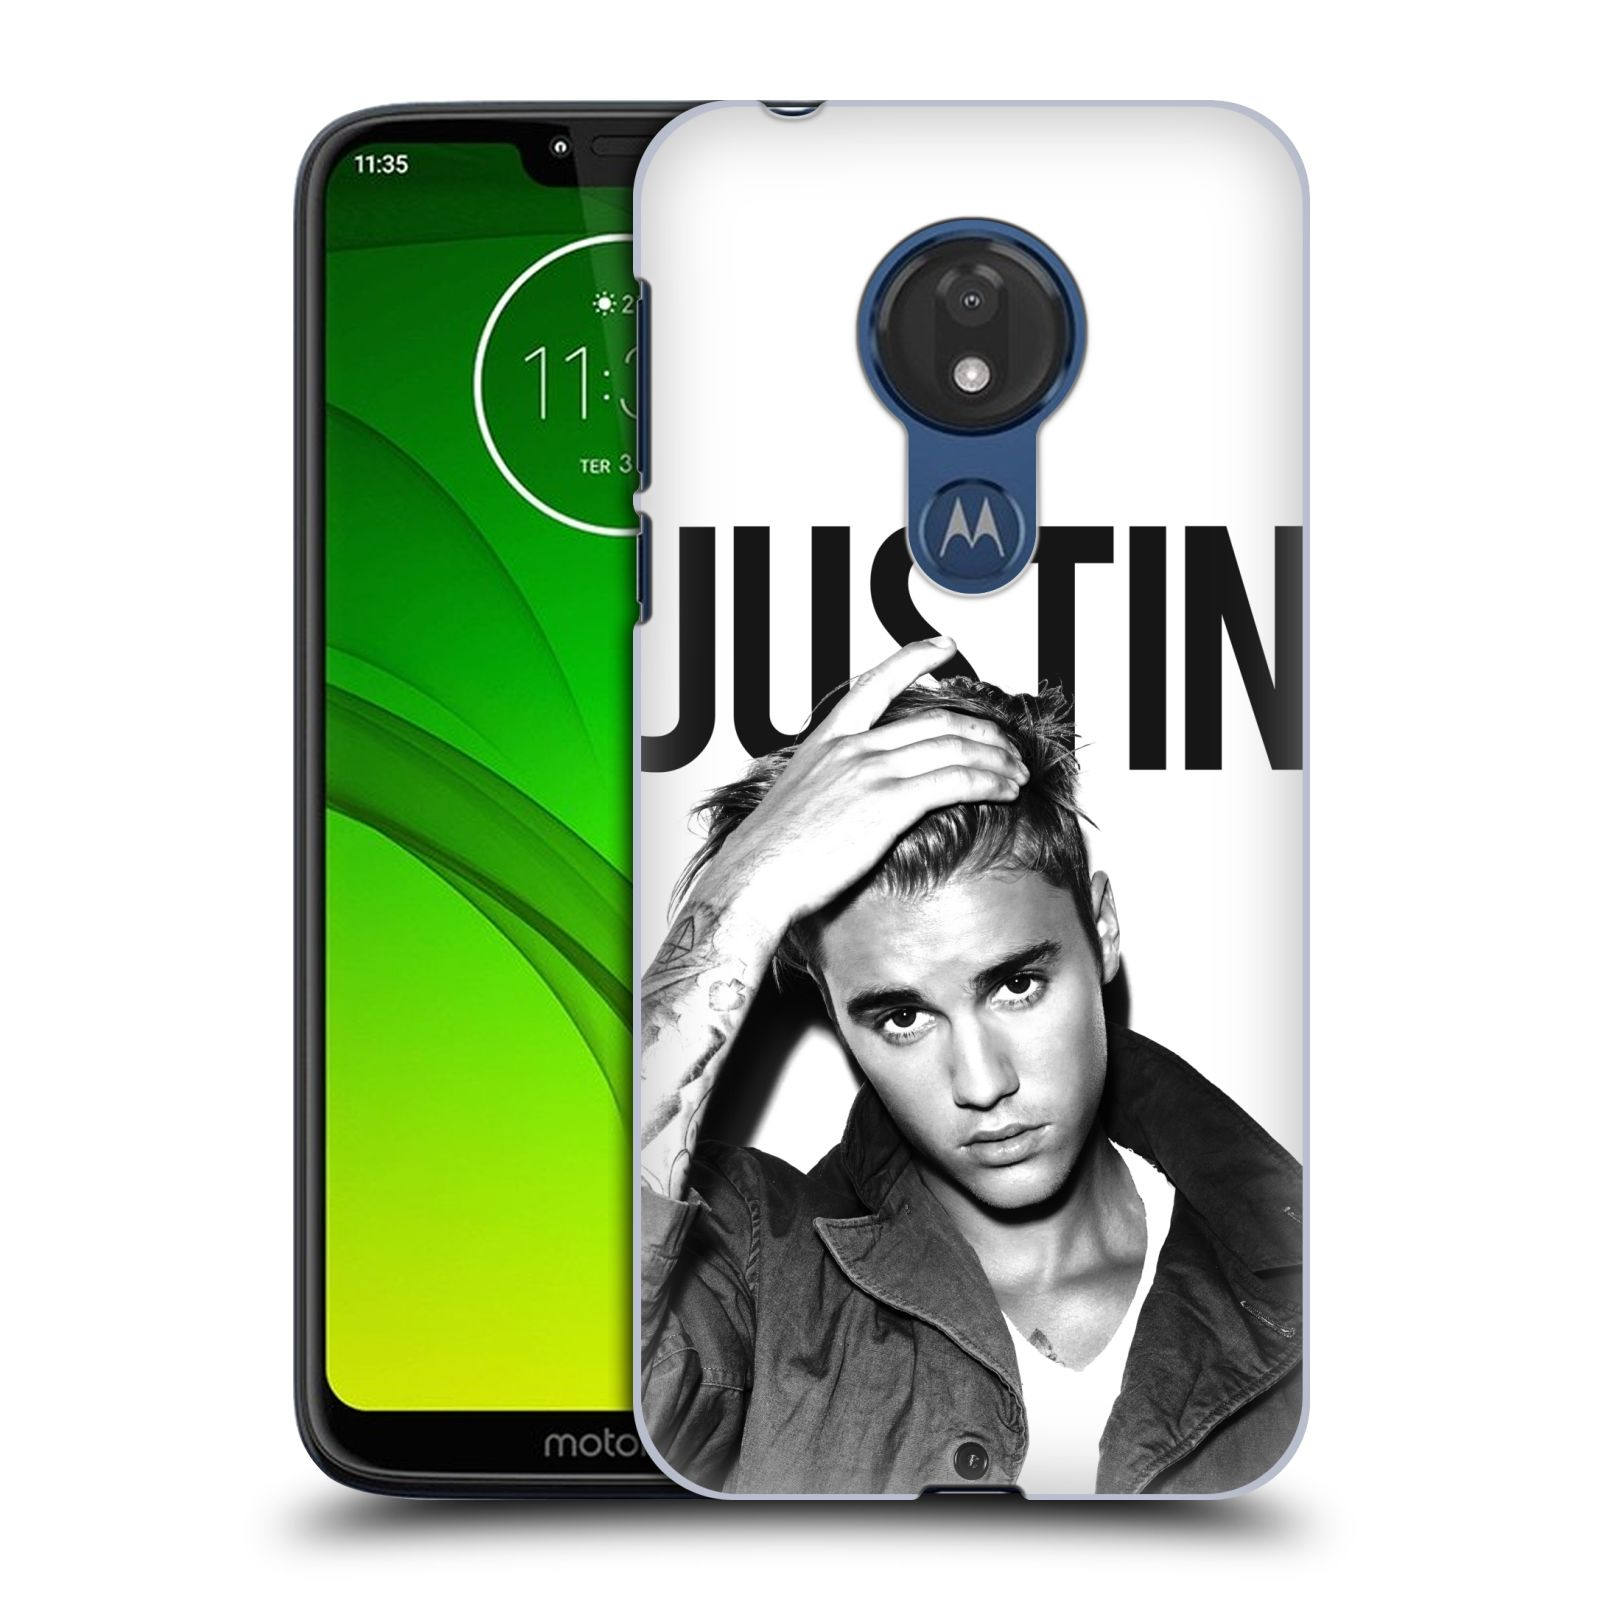 Plastové pouzdro na mobil Motorola Moto G7 Power - Head Case - Justin Bieber Official - Póza